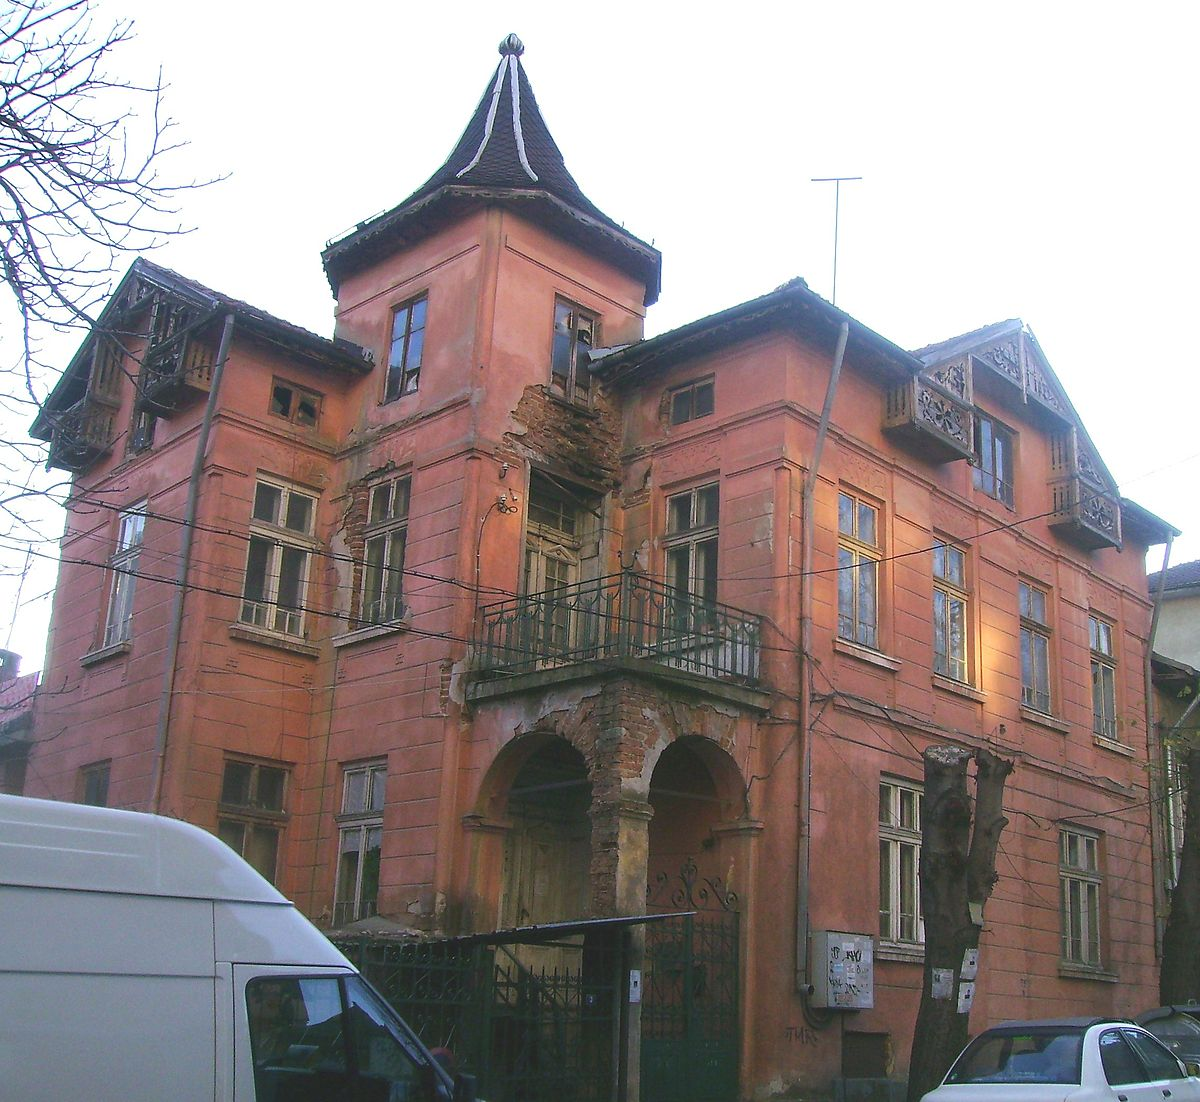 Casa embrujada wikipedia la enciclopedia libre for Creador de casas